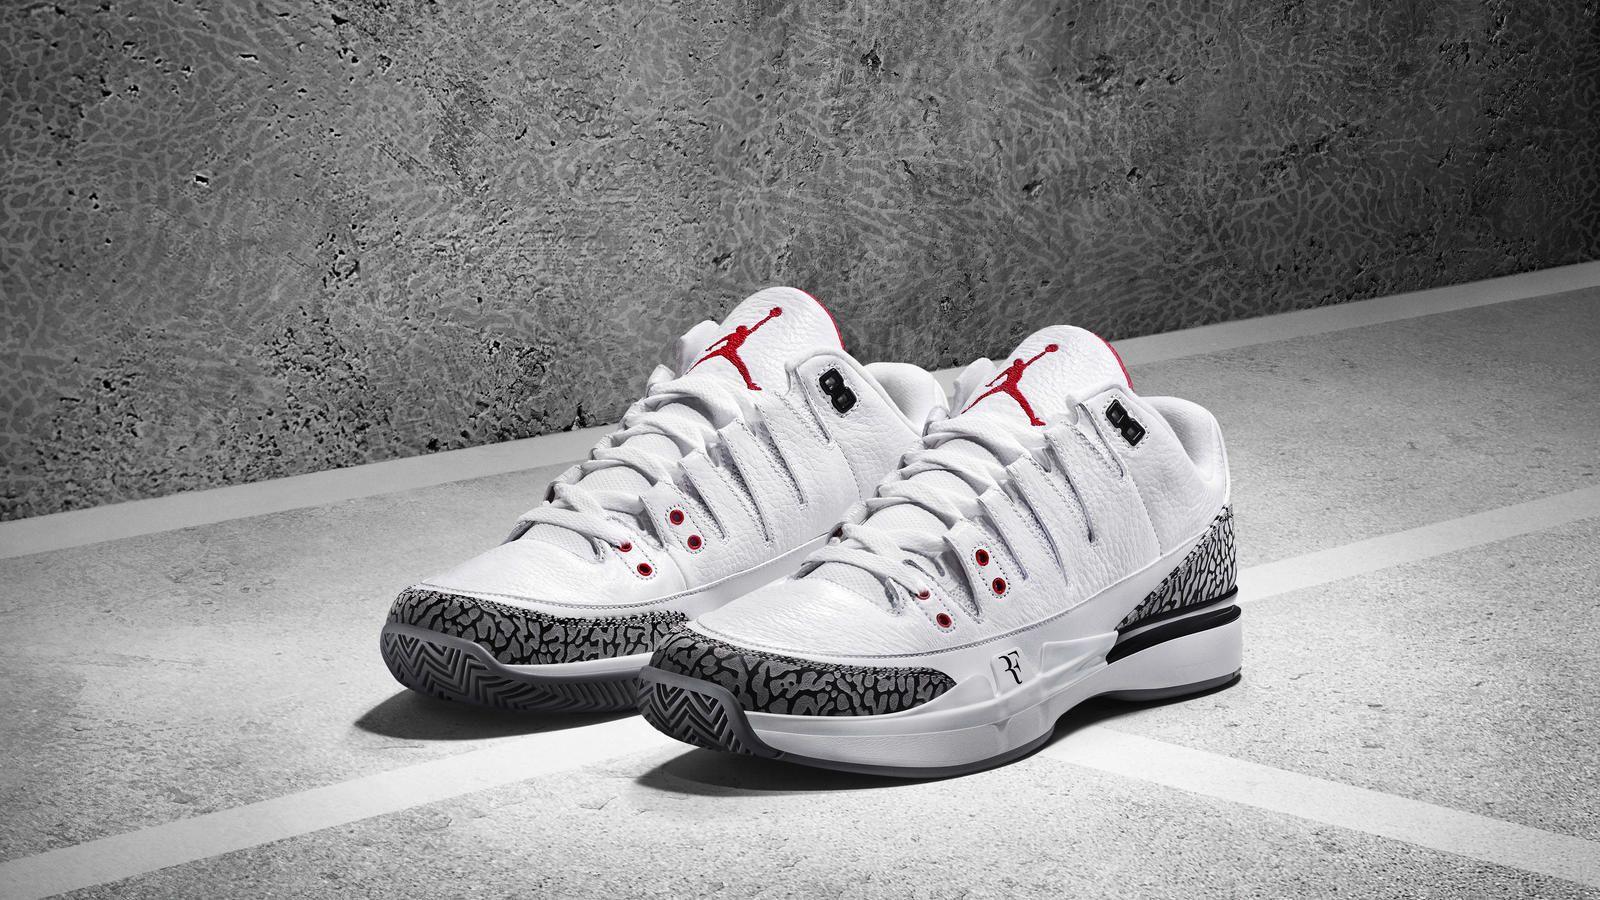 Connecting The Courts: NikeCourt Zoom Vapor AJ3 By Jordan | Air jordans,  Nike tennis shoes, Sneakers men